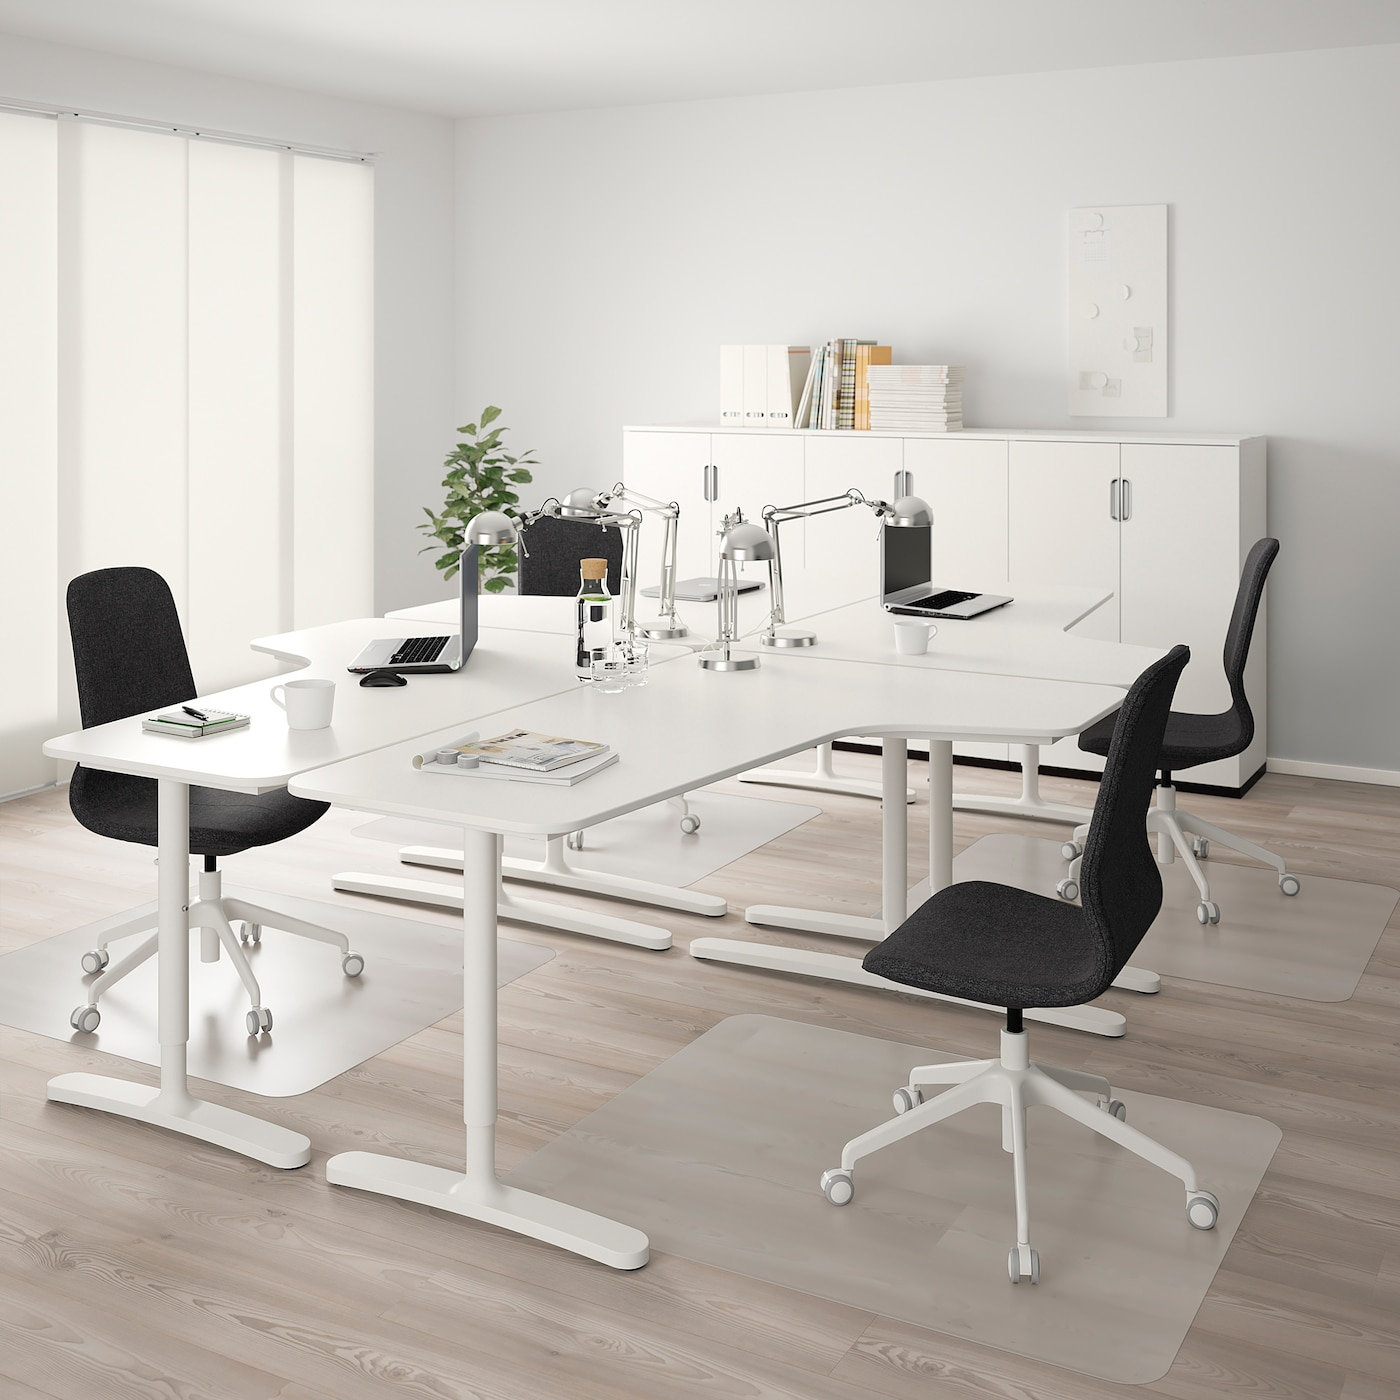 Corner office desk LARGE RIGHT HAND DESK ONLY NO DESK TIDY ##